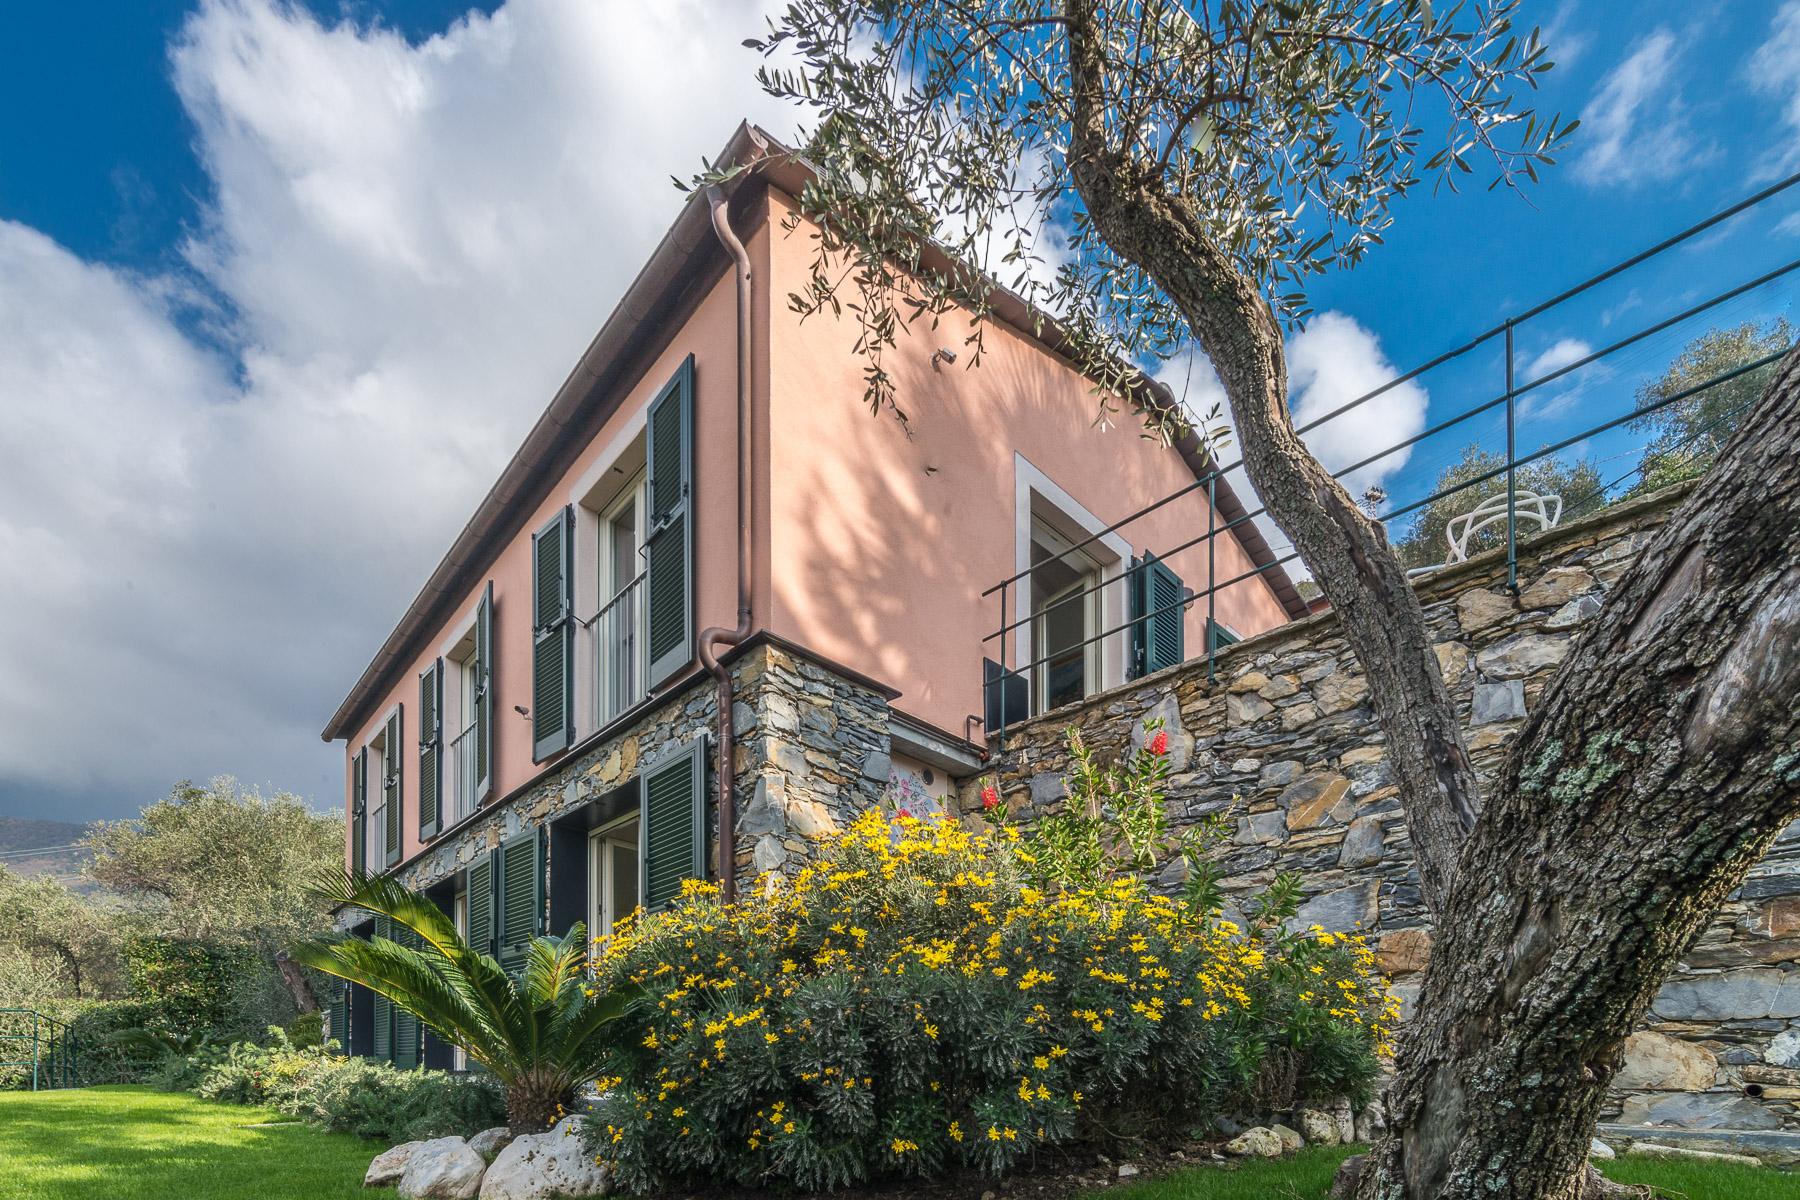 Single Family Home for Sale at Charming villa with views on the Italian Riviera Via Solari e Queirolo Zoagli, Genoa 16035 Italy